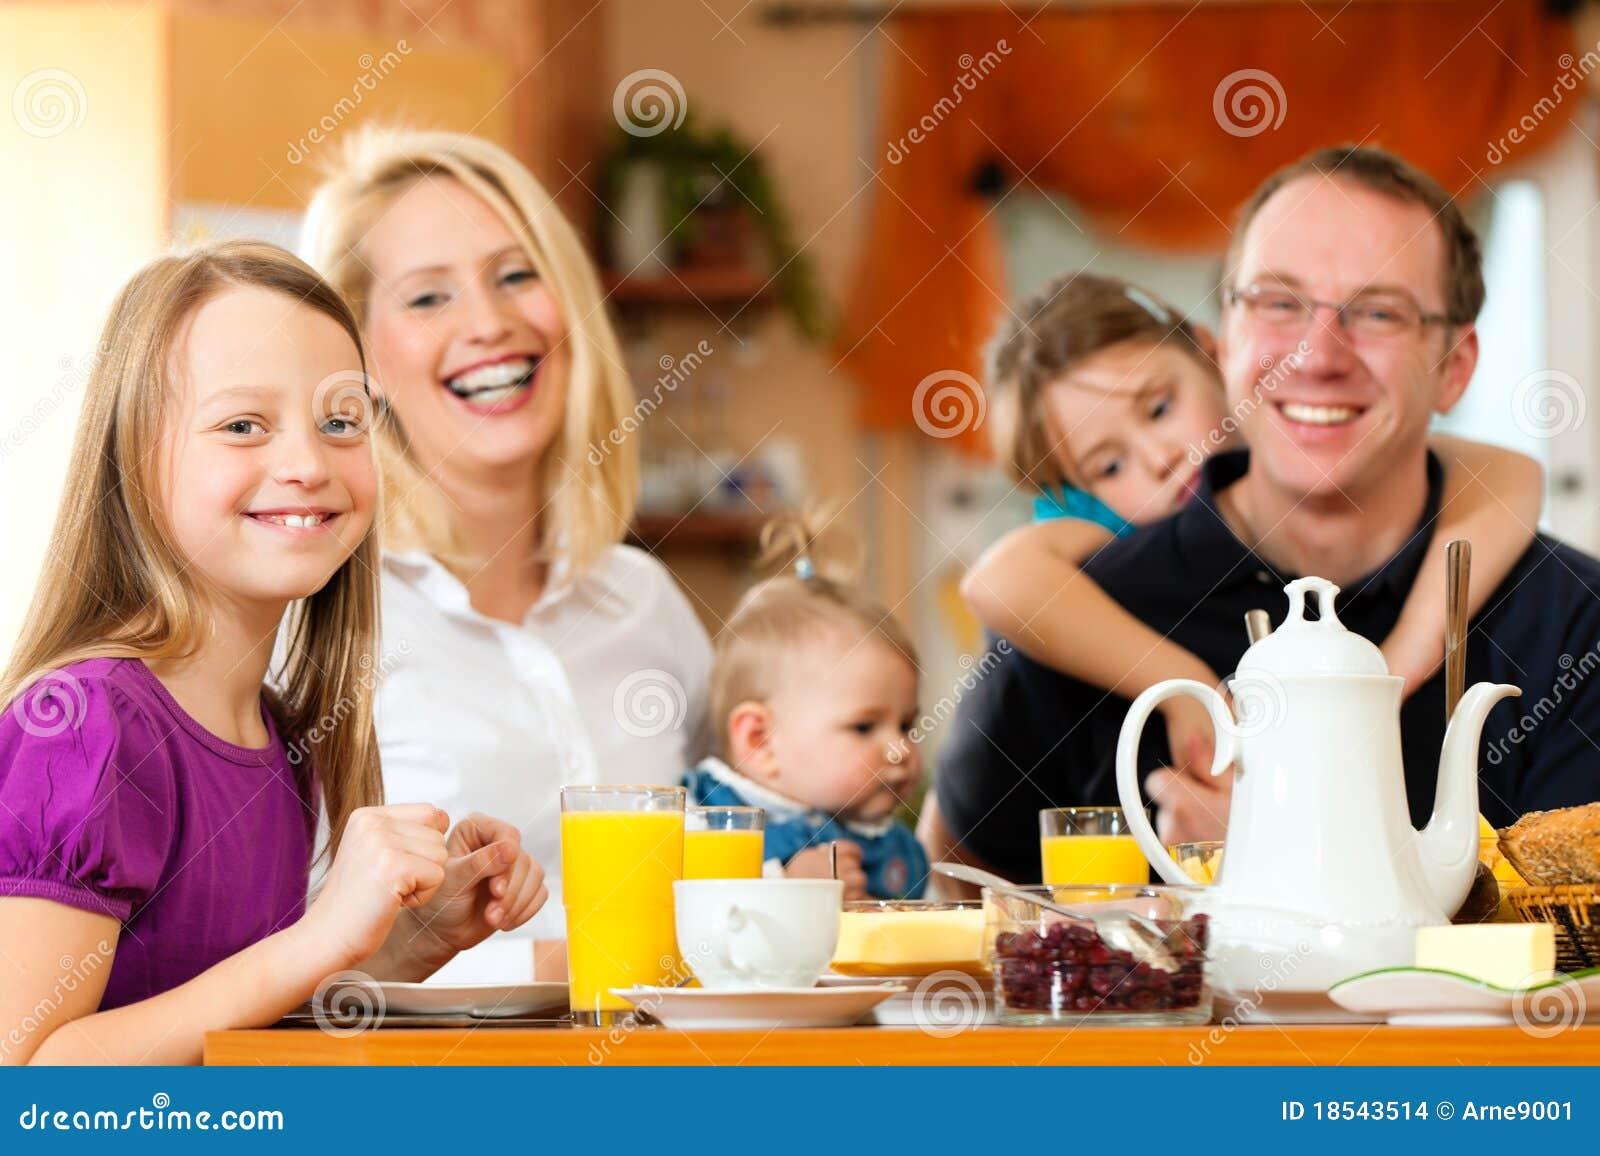 family eating breakfast - HD1200×800